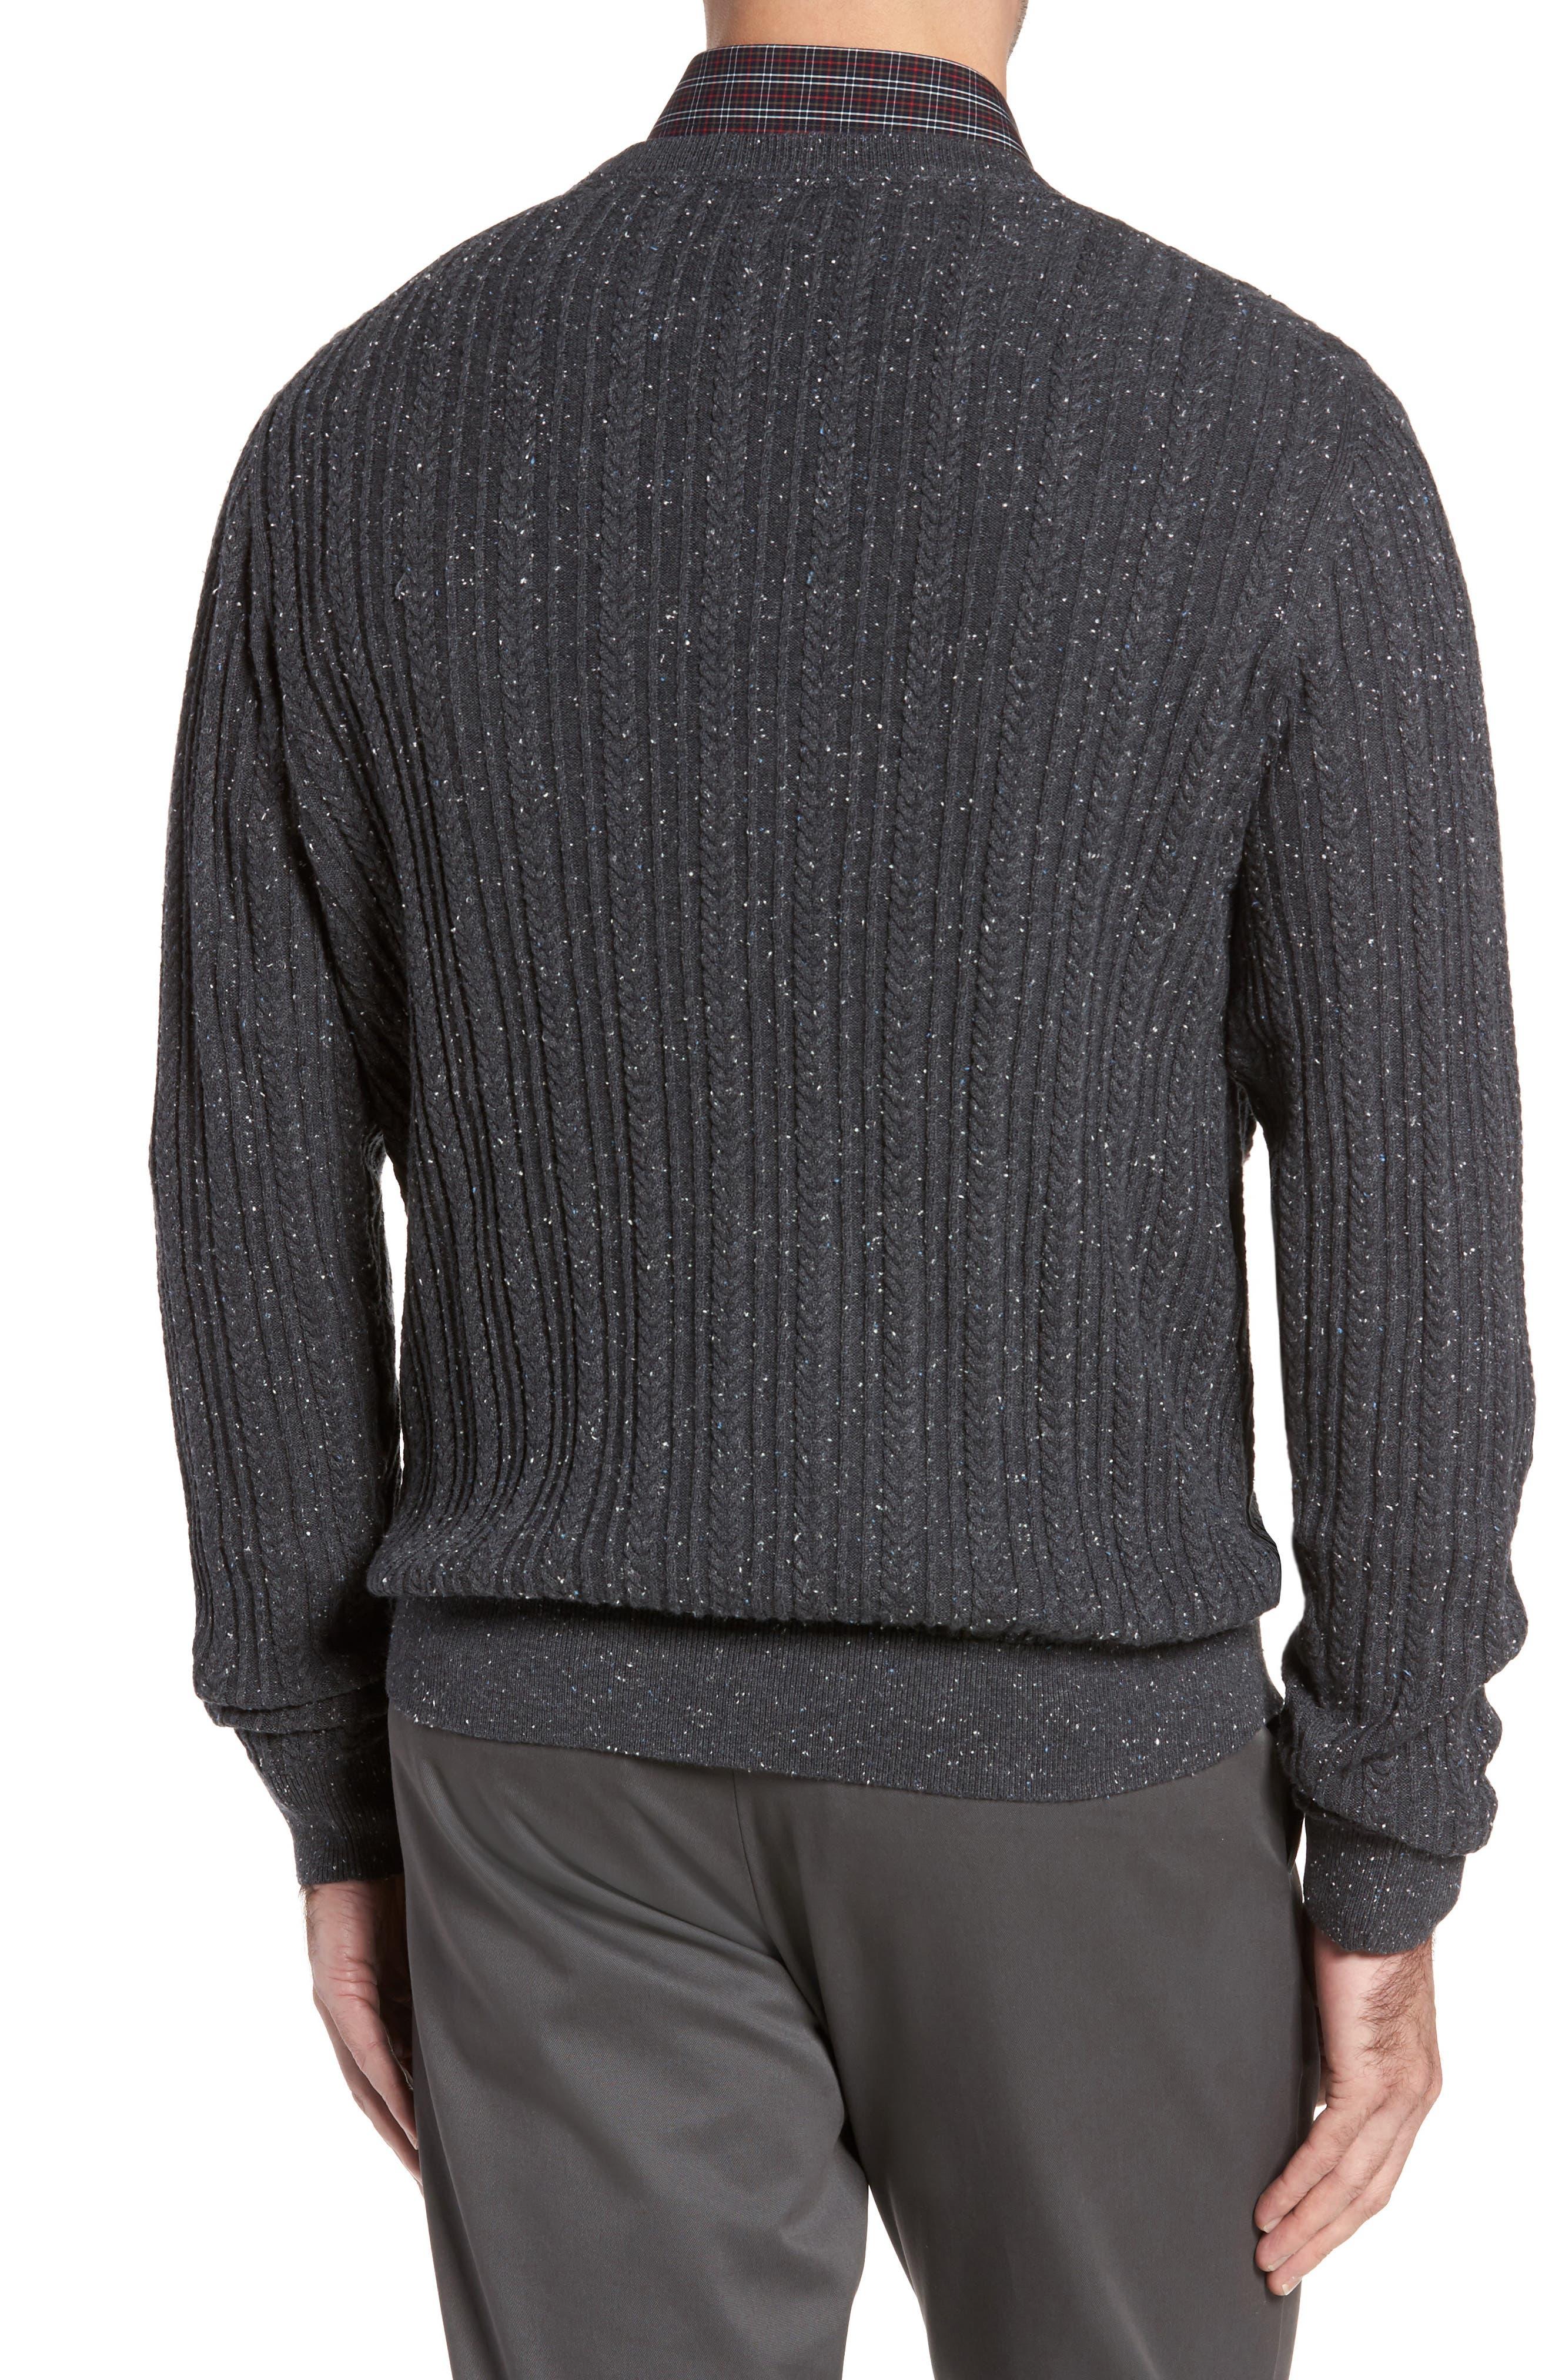 Carlton Crewneck Sweater,                             Alternate thumbnail 2, color,                             020